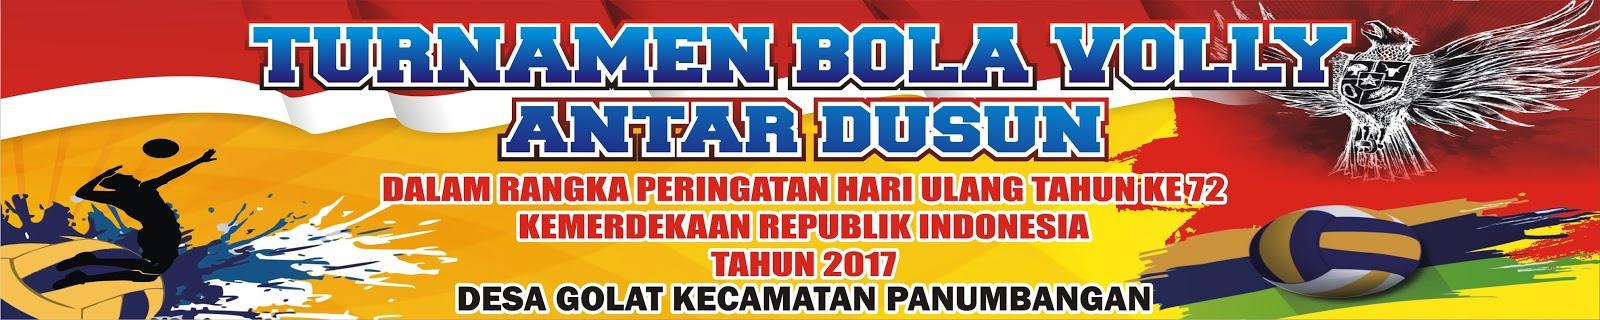 Spanduk Turnamen Bola Volly Antar Dusun Cdr